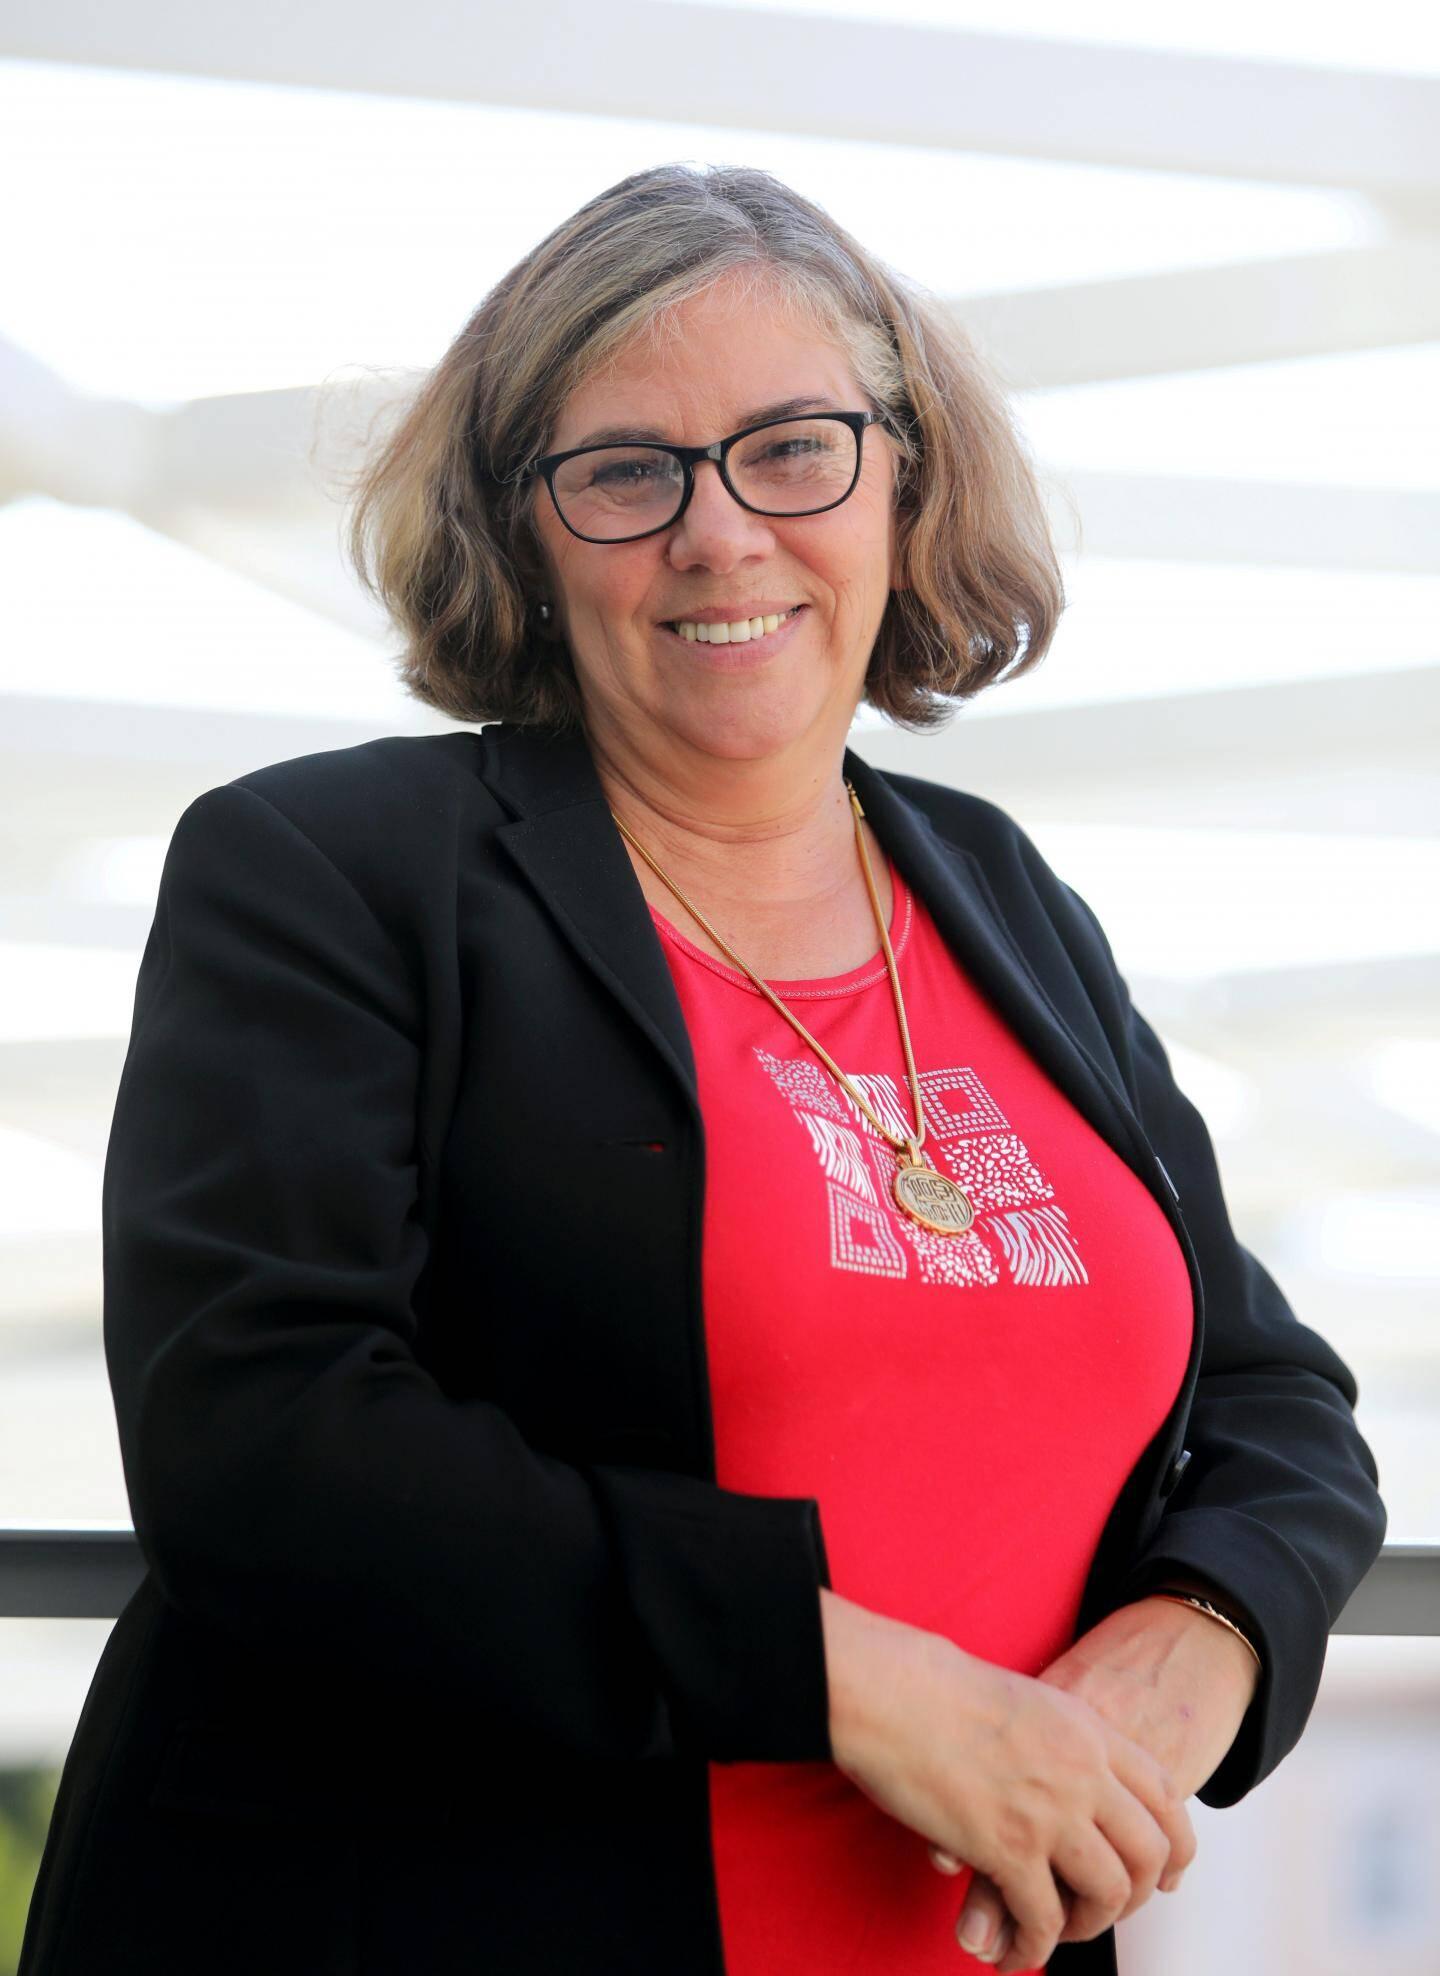 Christine Scaramozzino, présidente fondatrice de La Maison du Bonheur.